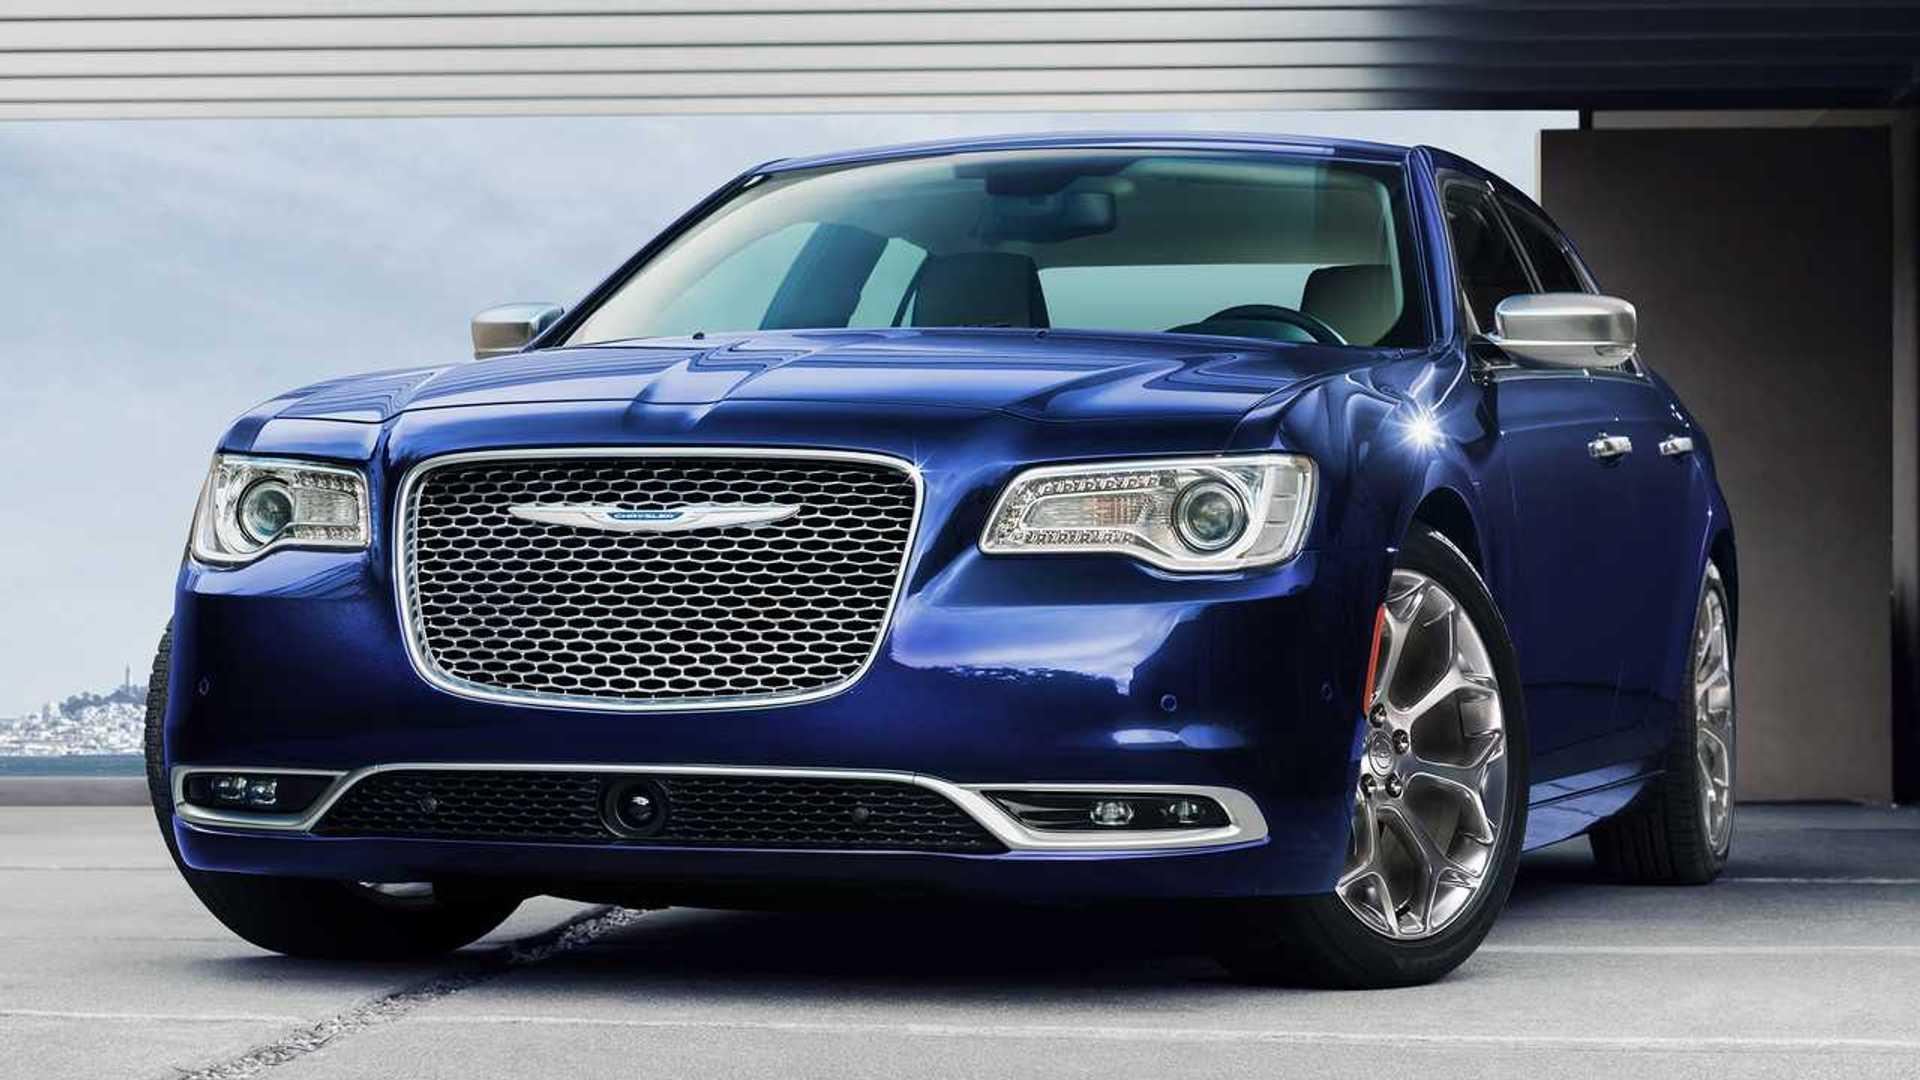 2021 Chrysler 300 Srt8 Exterior and Interior